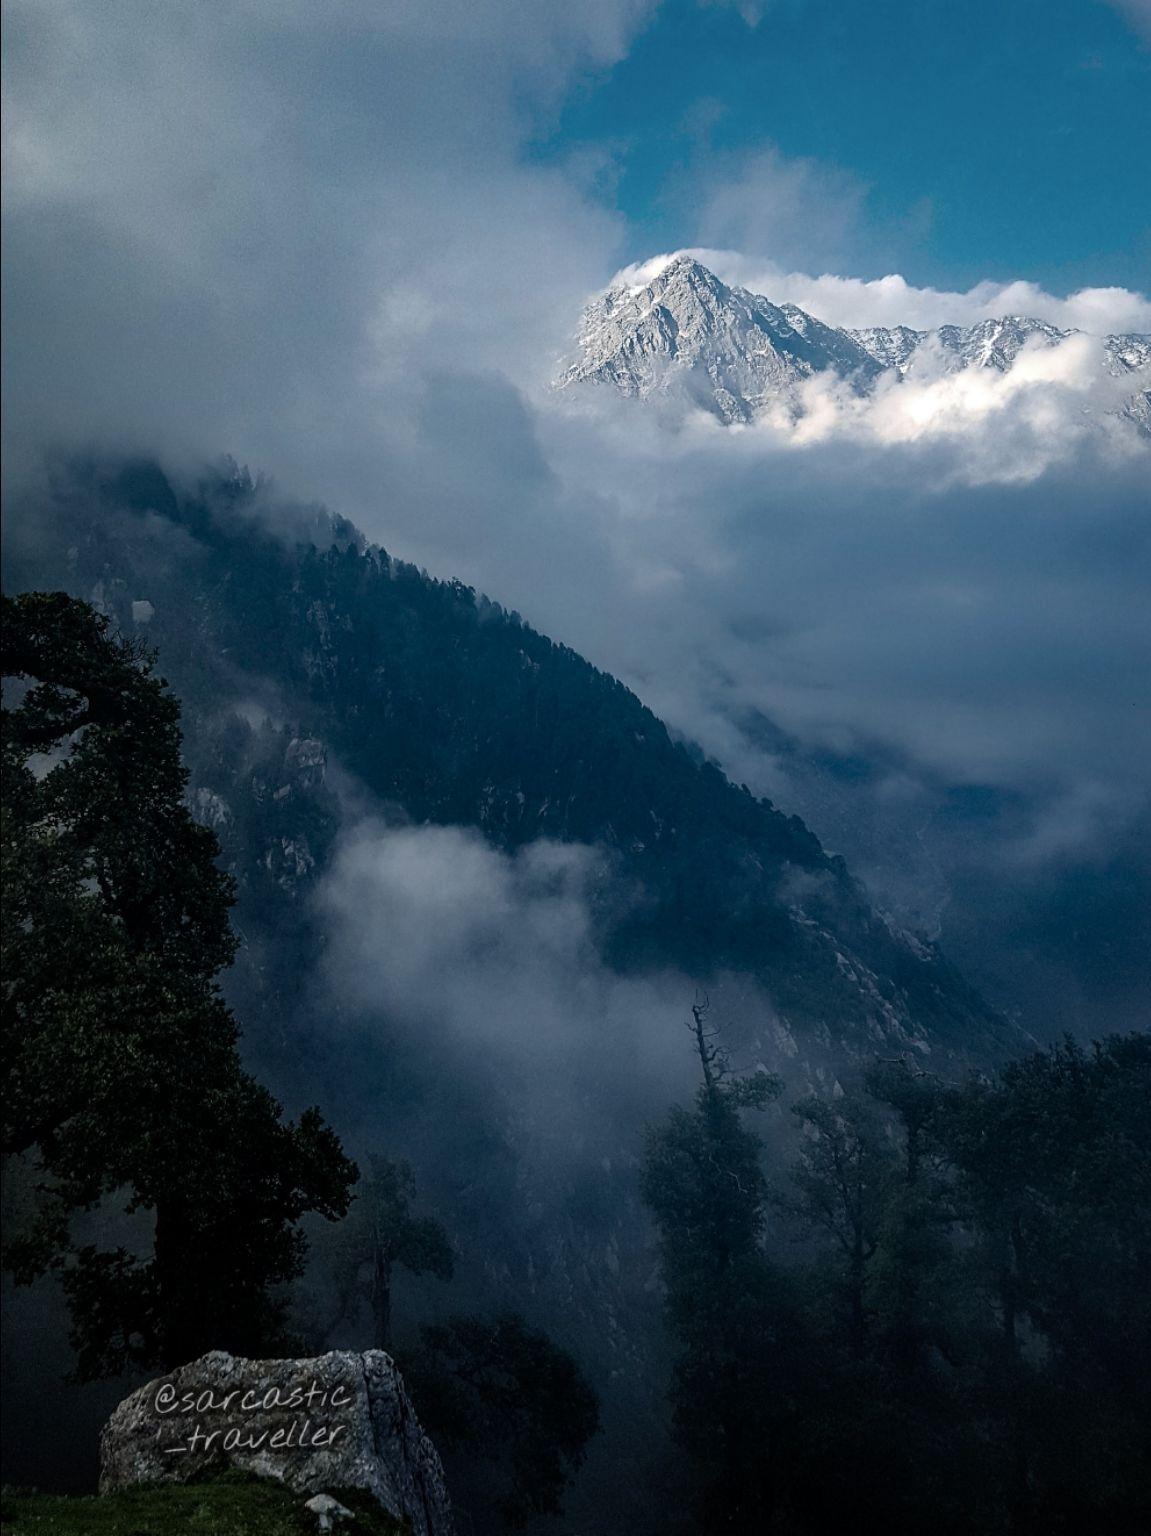 Photo of McLeod Ganj By Sarcastic_traveller